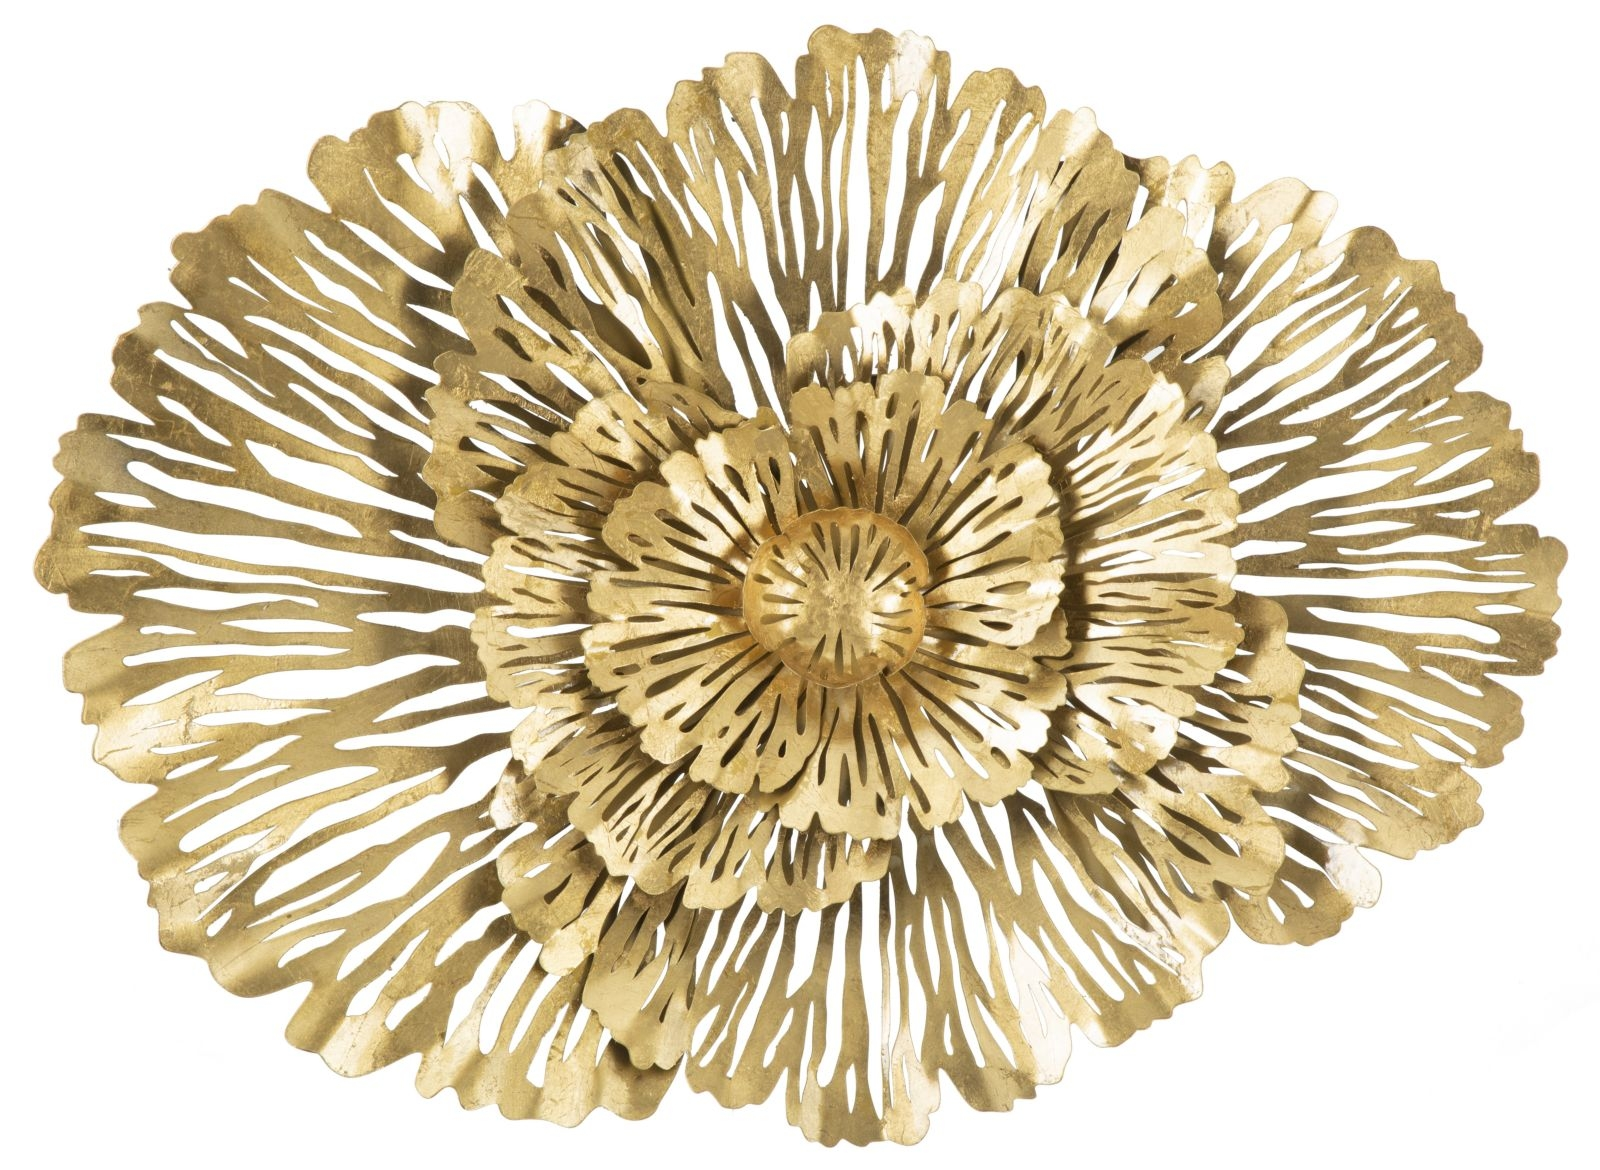 Decoratiune metalica de perete Ibis Glam Auriu, l74xA10xH55 cm poza